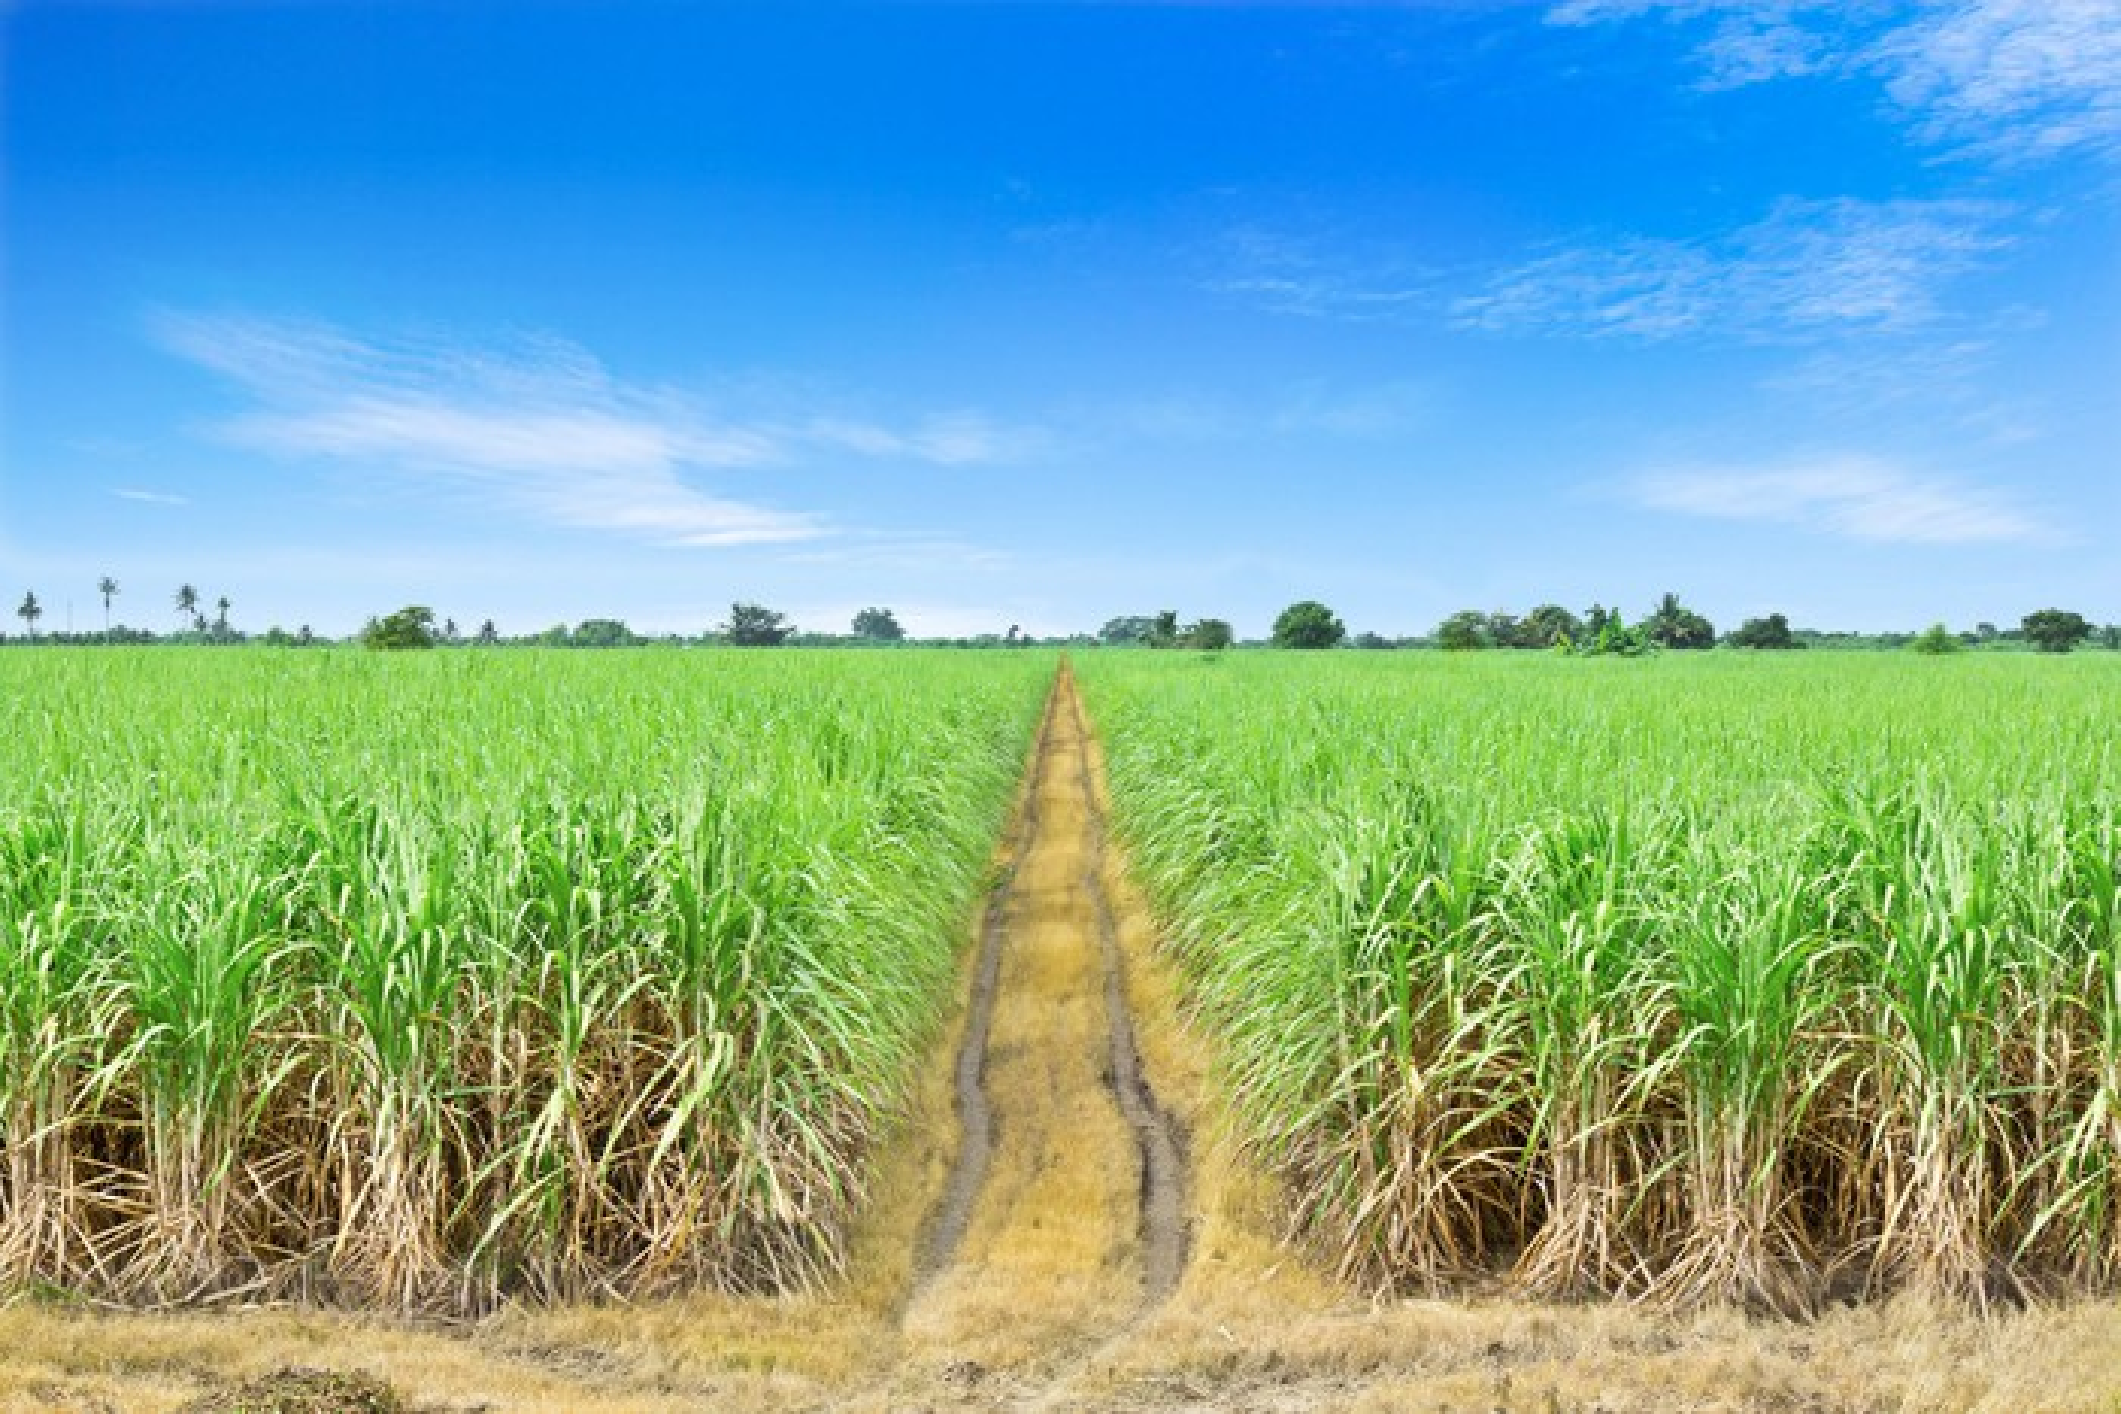 A sugarcane field.